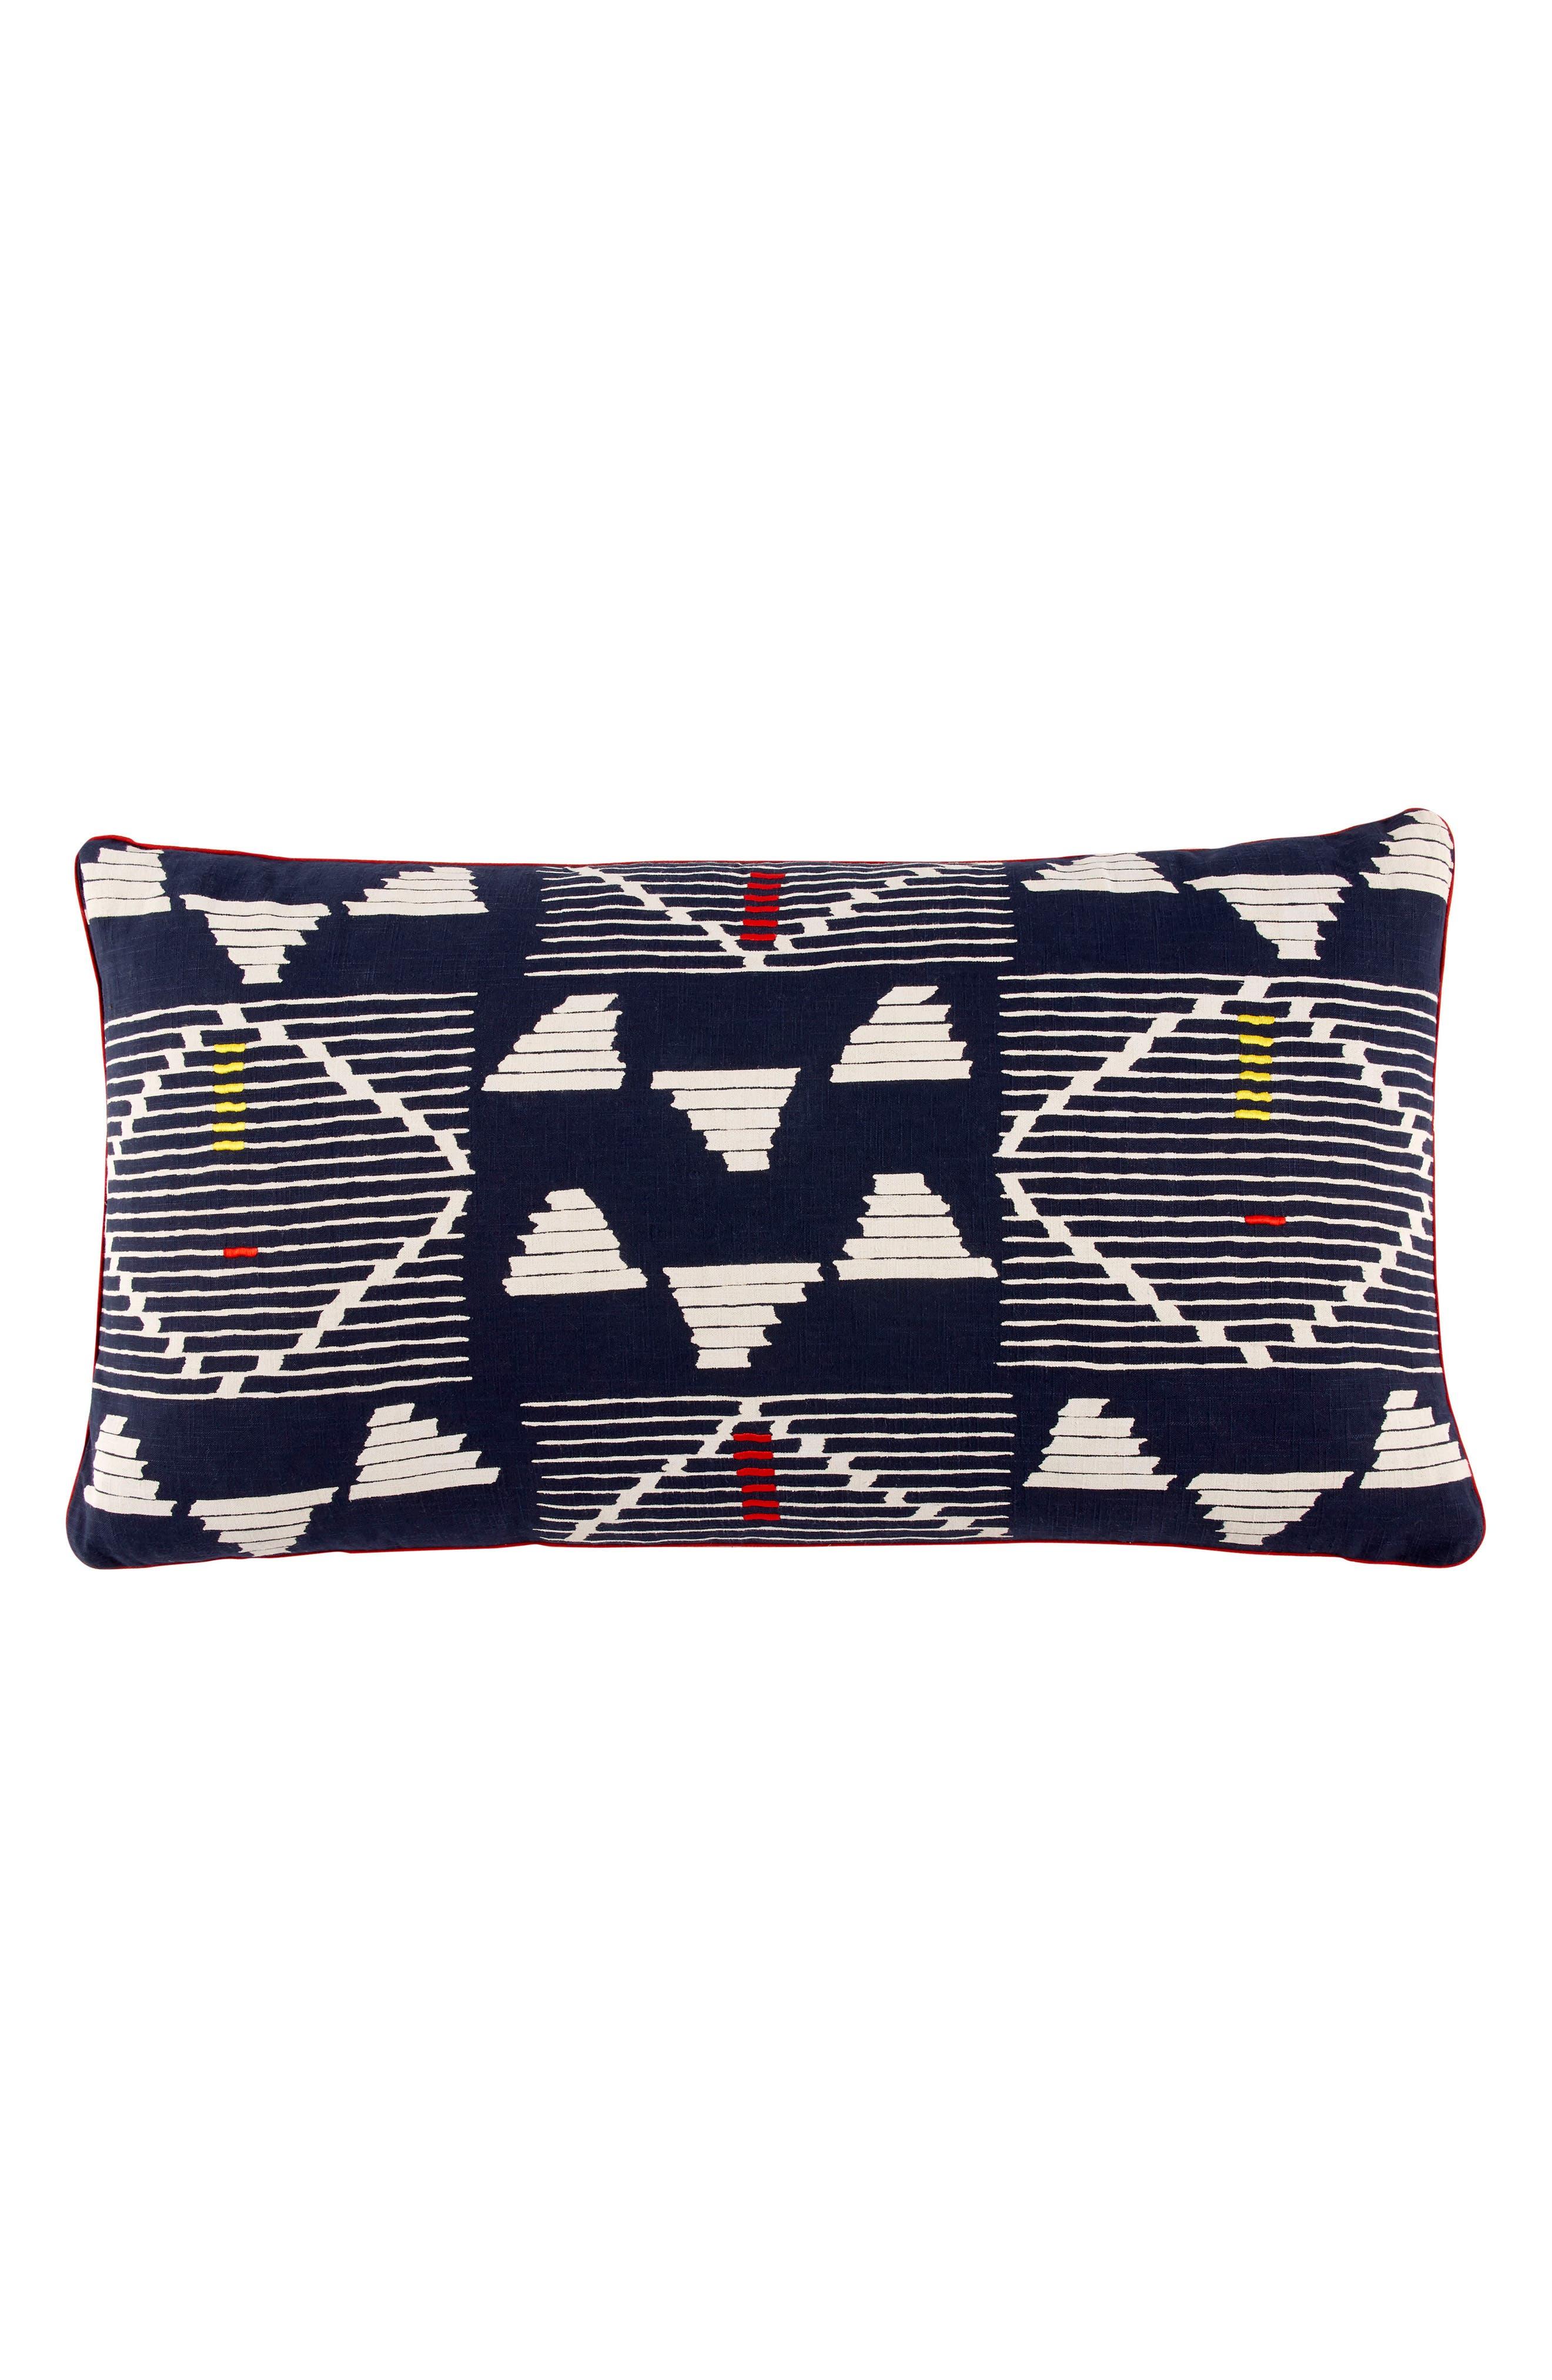 Main Image - John Robshaw Kambu Bolster Decorative Pillow